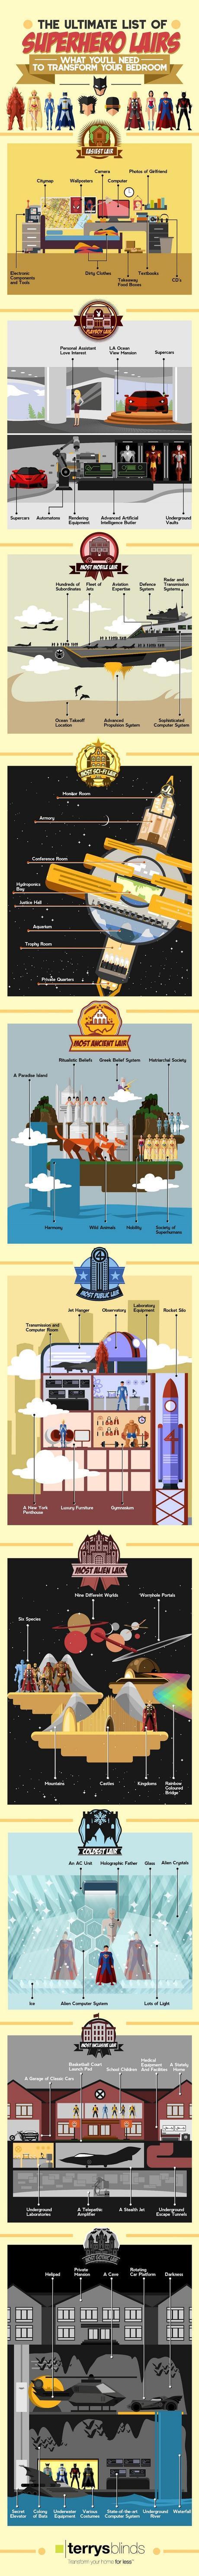 superhero-lairs-infographic